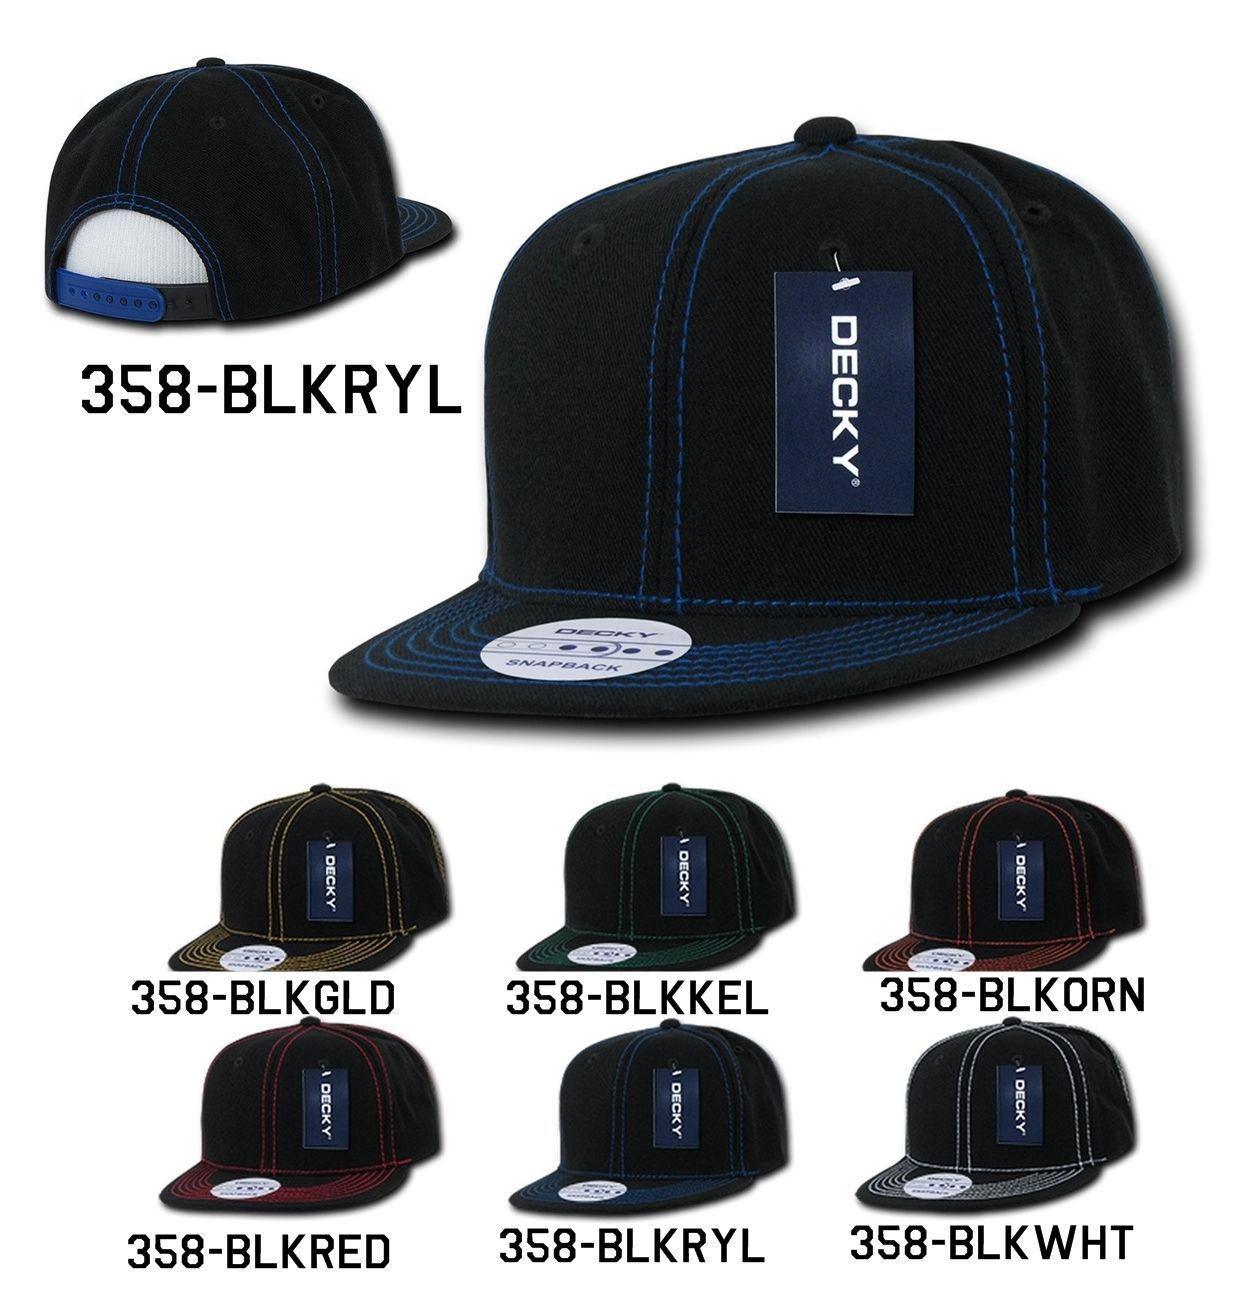 CUSTOM EMBROIDERY Personalized Customized Decky Contra-Stitch Snapback Cap 358